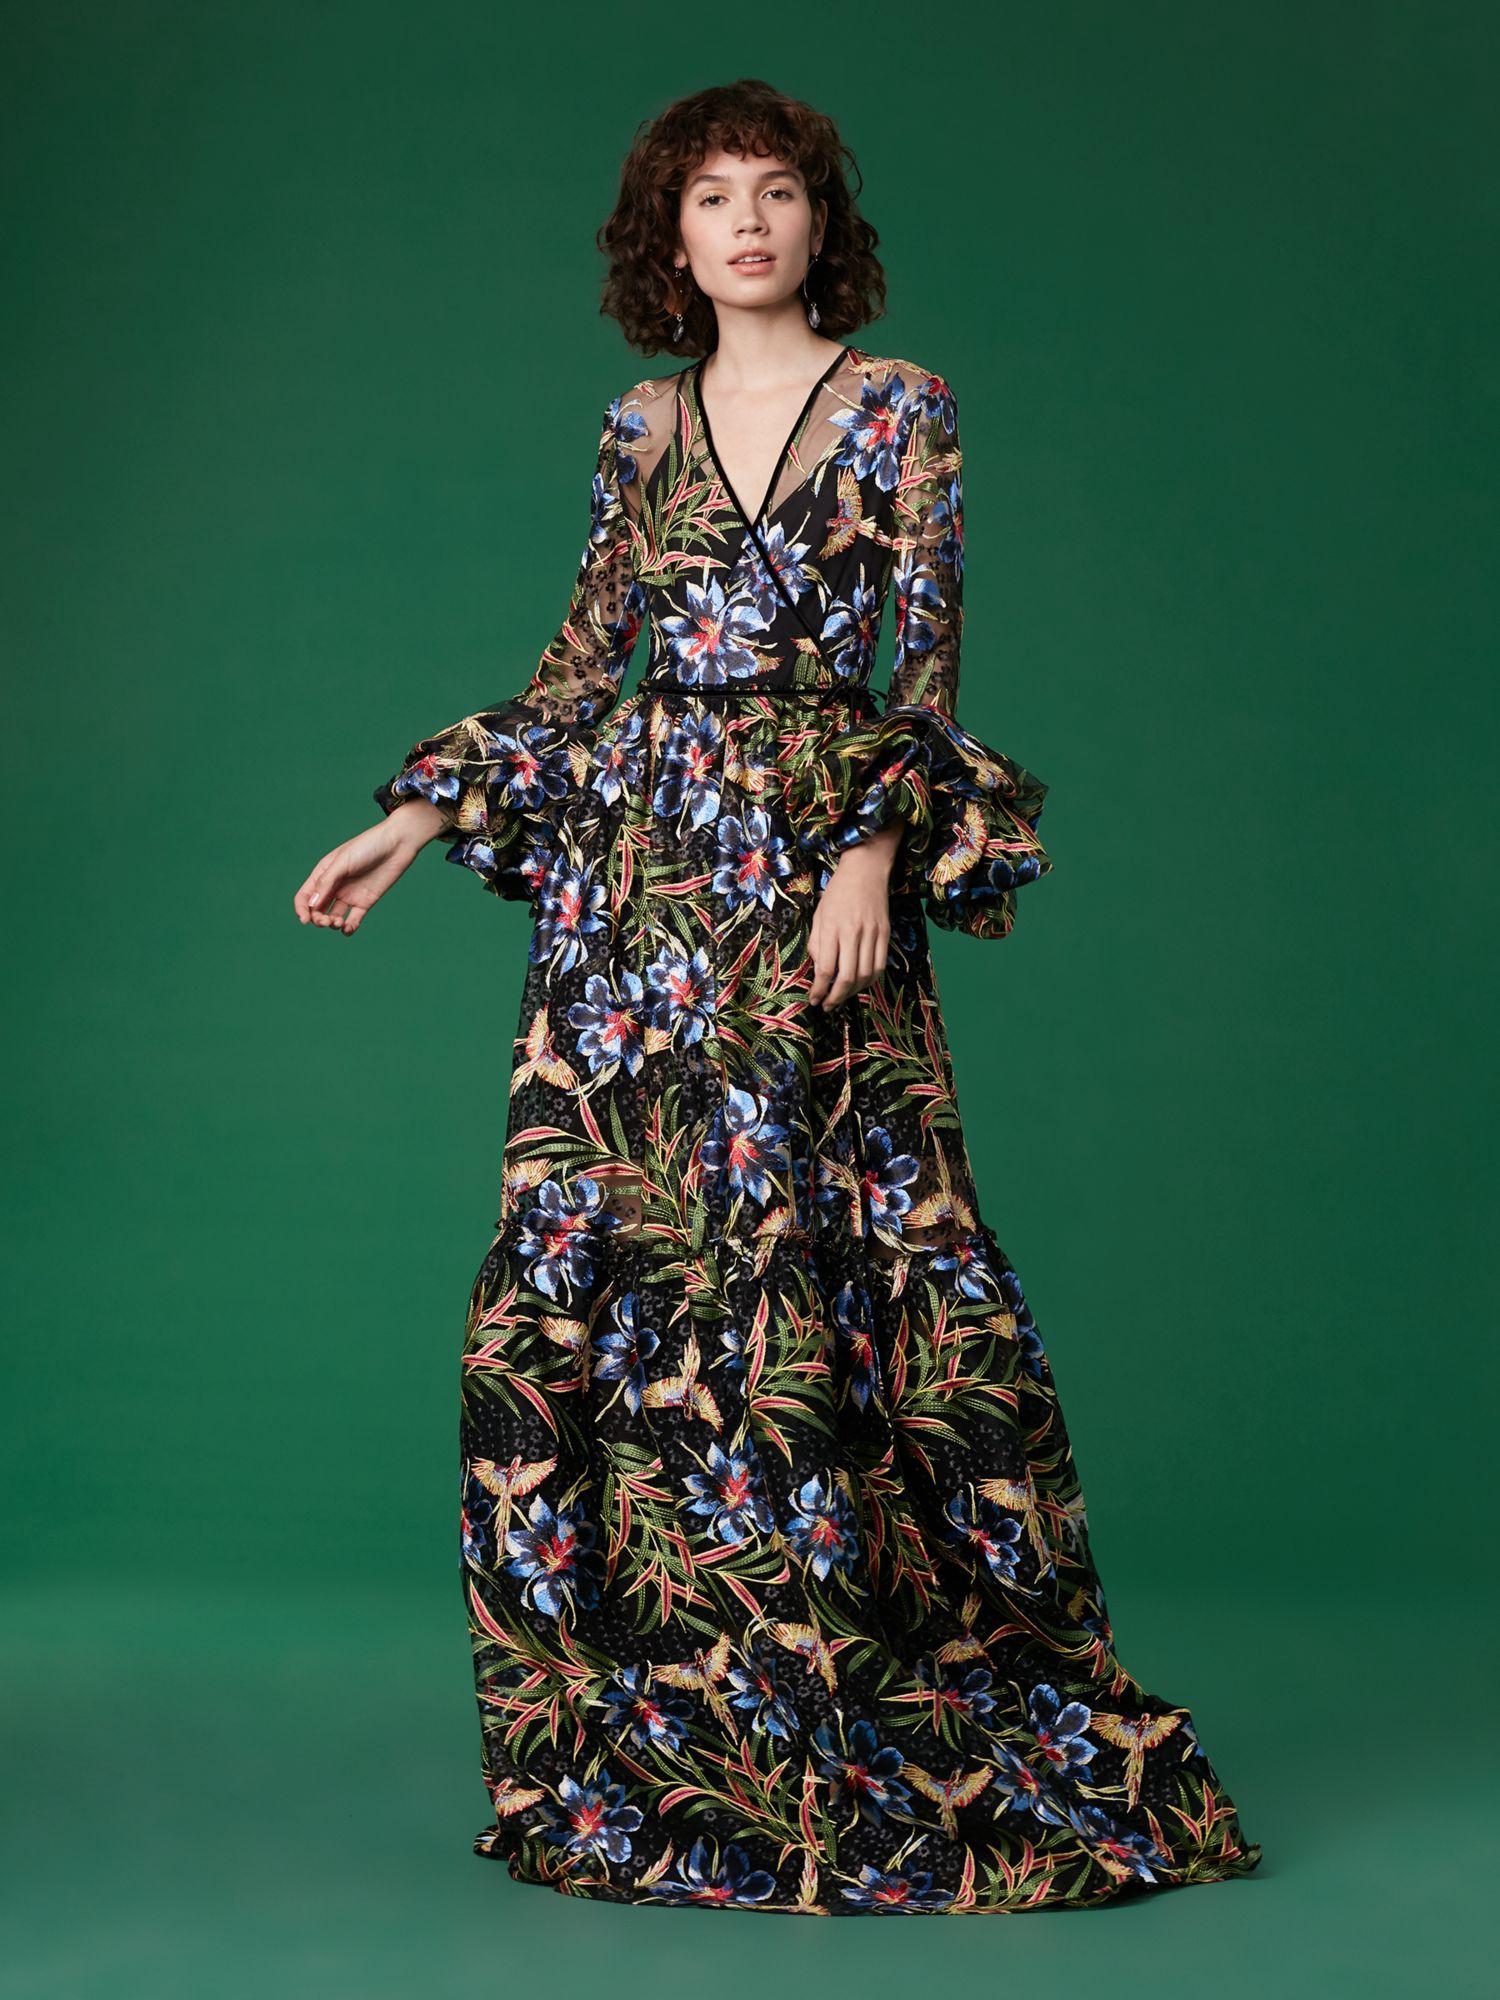 532a42393b53 Diane Von Furstenberg Dvf Puff Sleeve Maxi Wrap Dress - Quincy Pearson  Multi 0